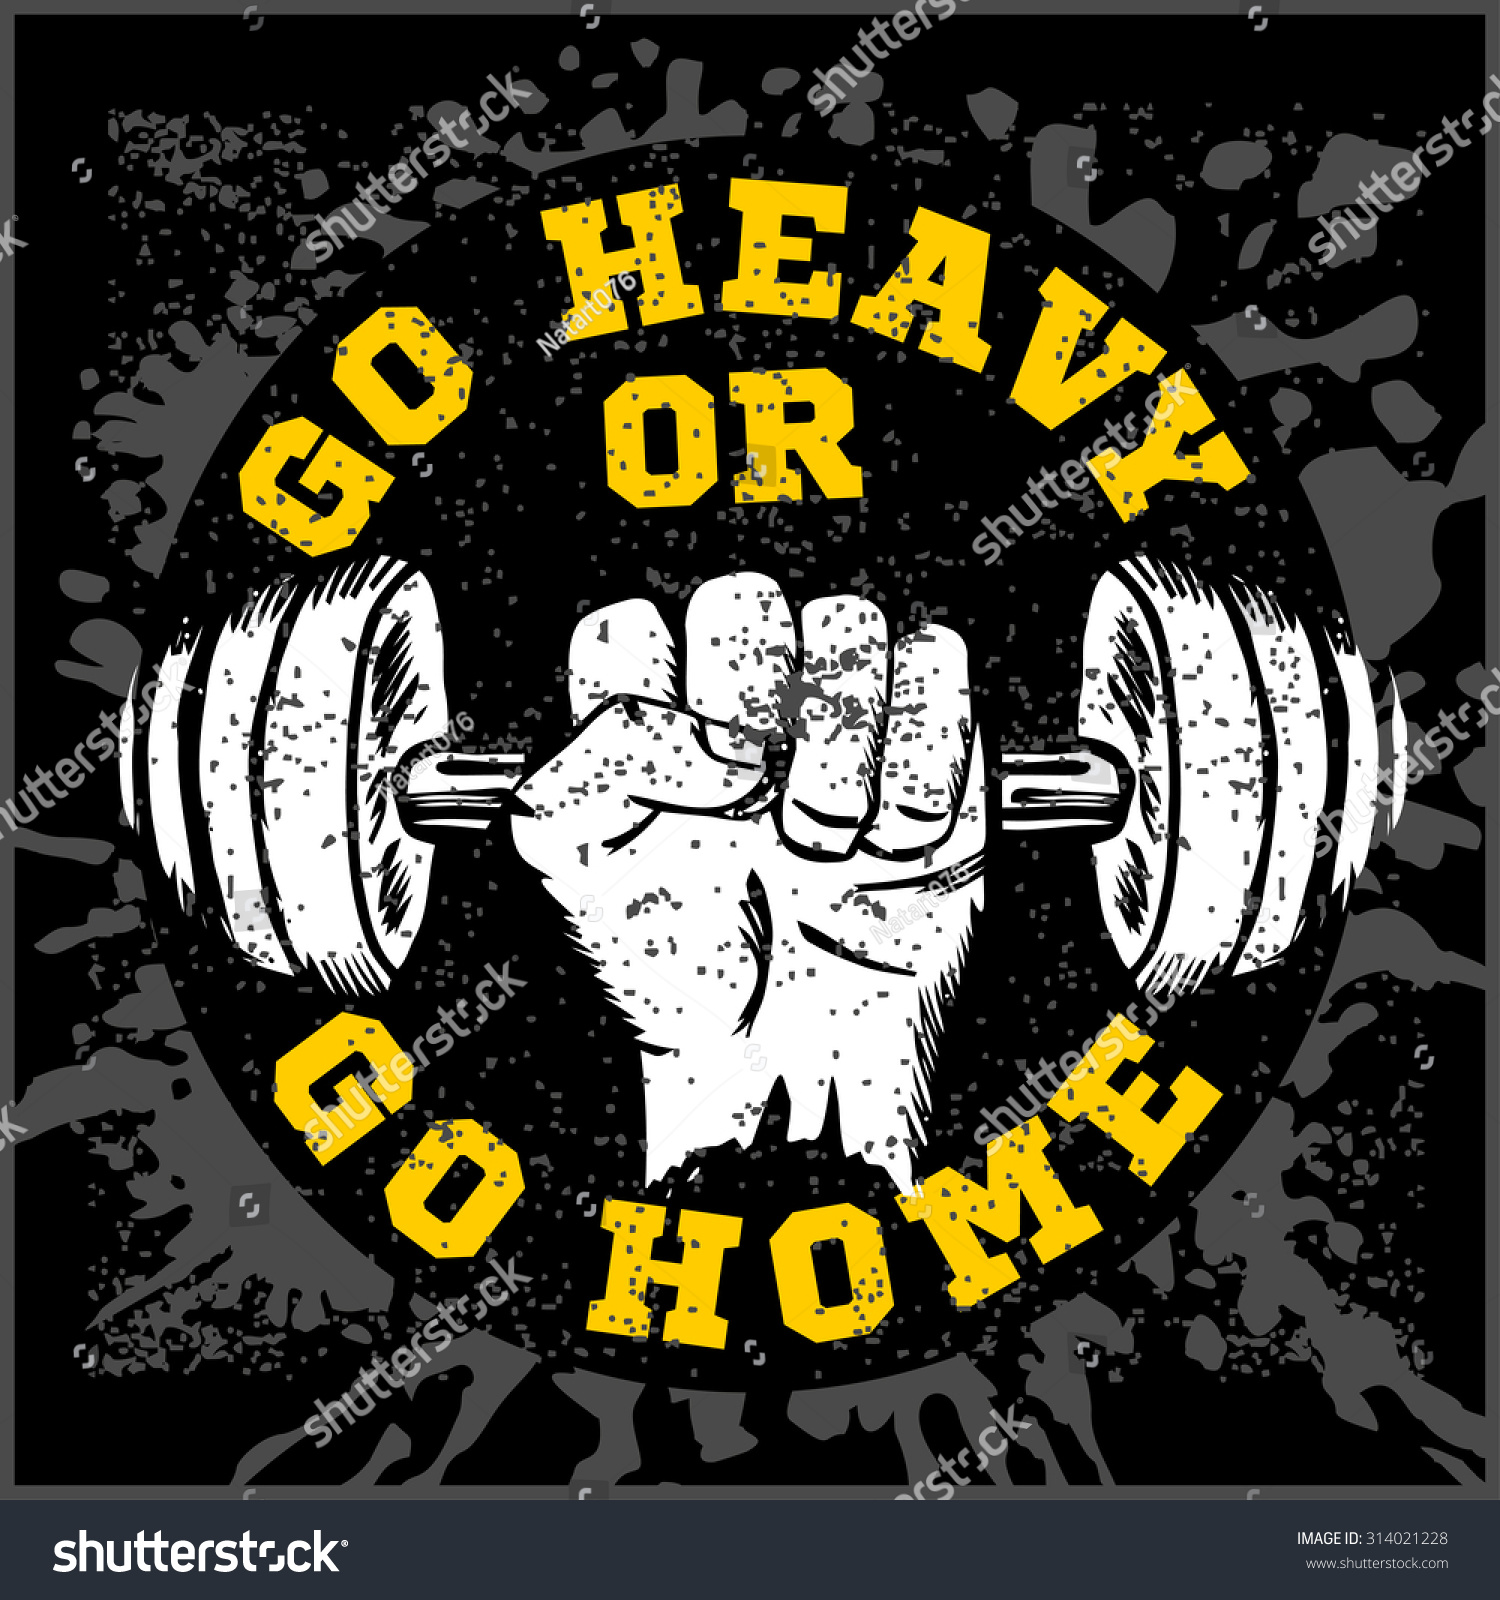 bodybuilding logo images